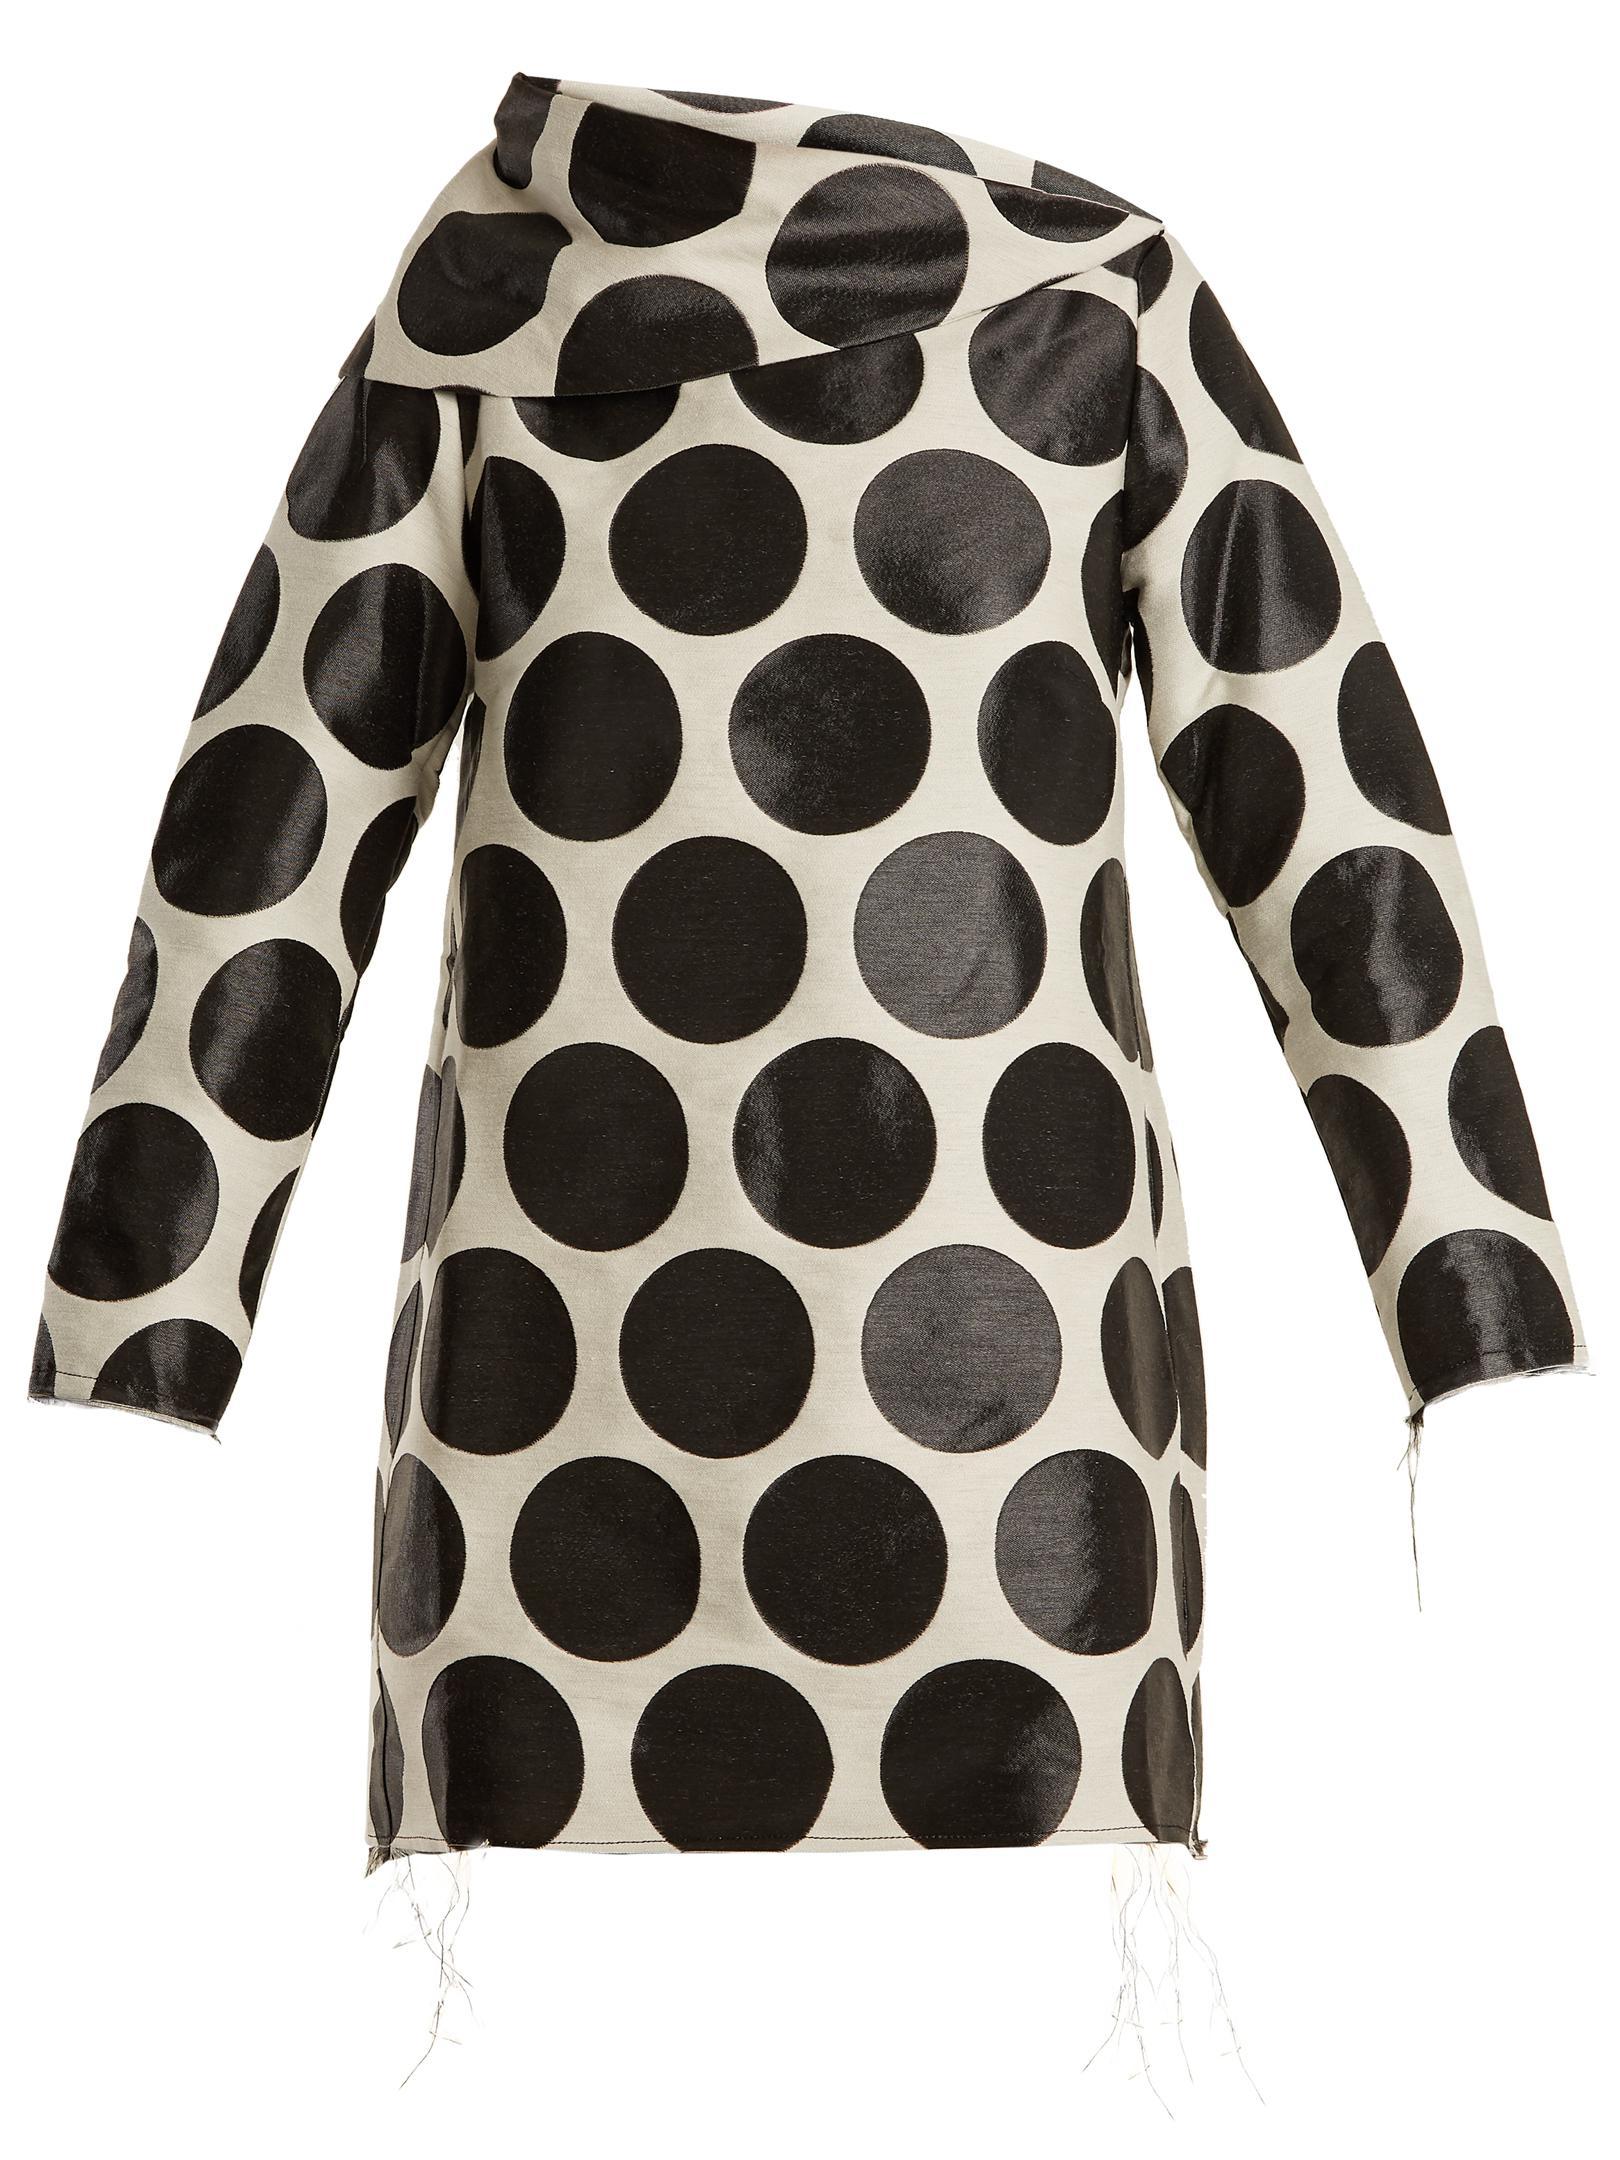 Circle-jacquard asymmetric-neck dress Marques Almeida 9c1vO2wq